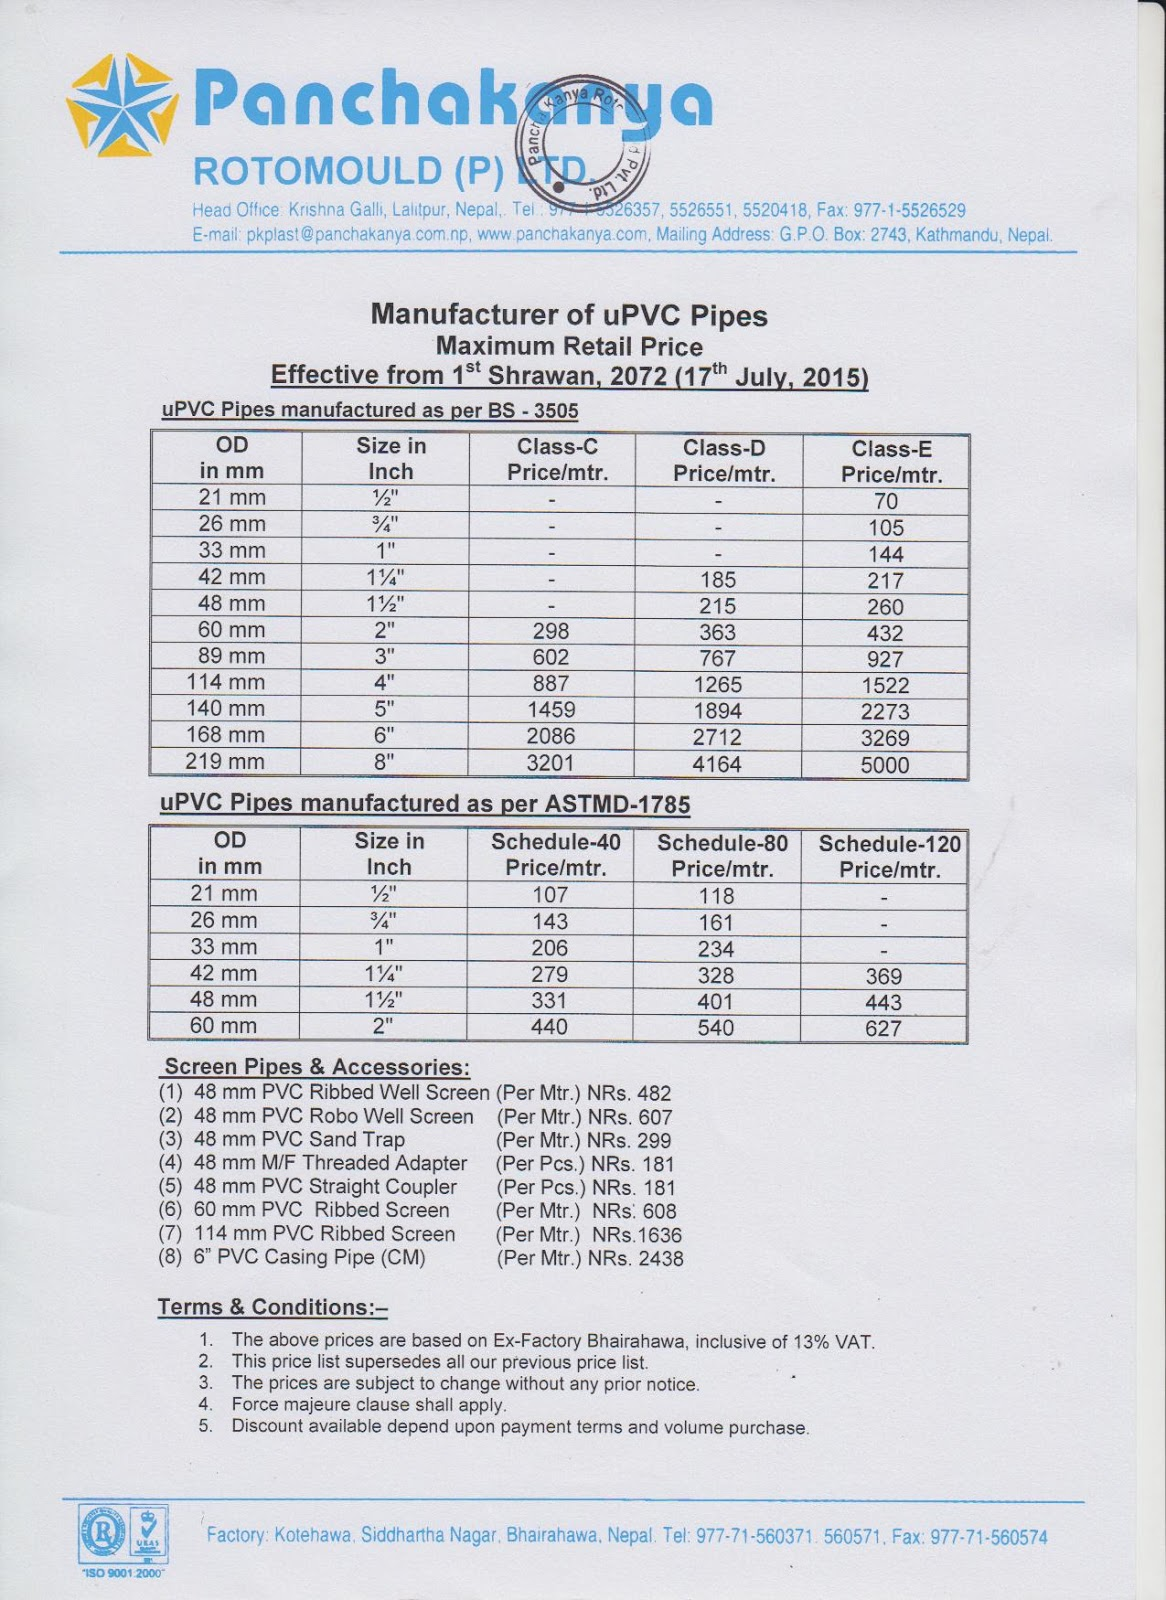 KISAN TRADING PVT  LTD : Latest Price List 2072-73